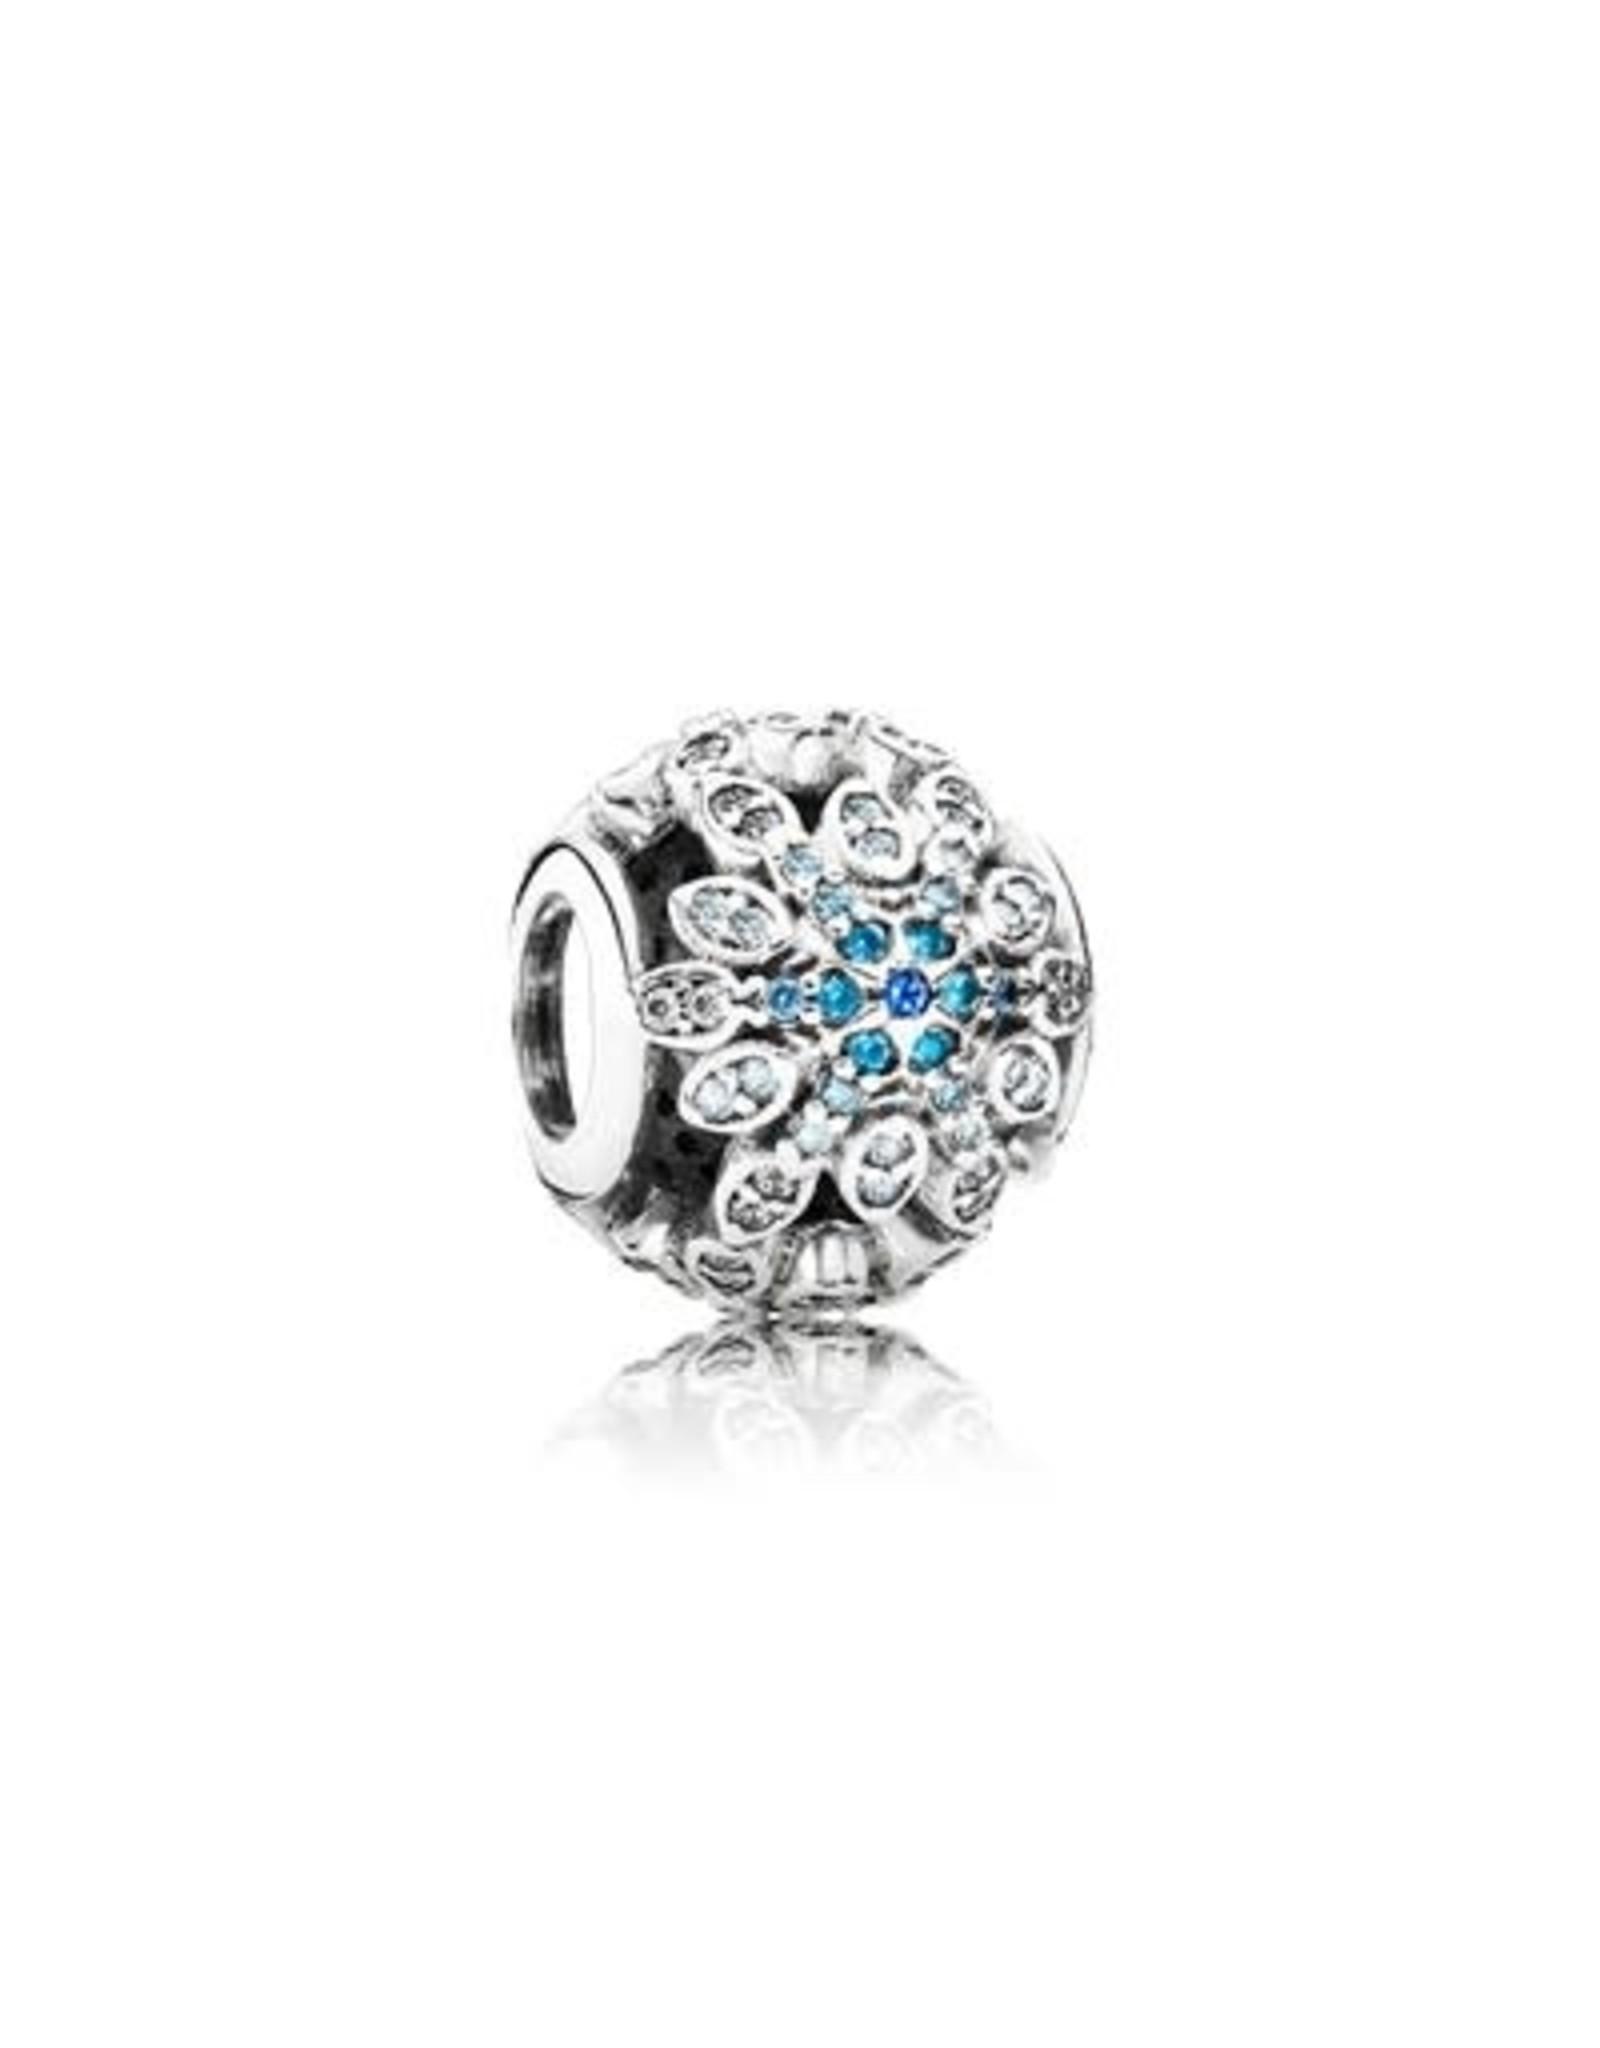 Pandora Pandora Charm, Crystalized Snowflakes, Blue Crystals & Clear CZ